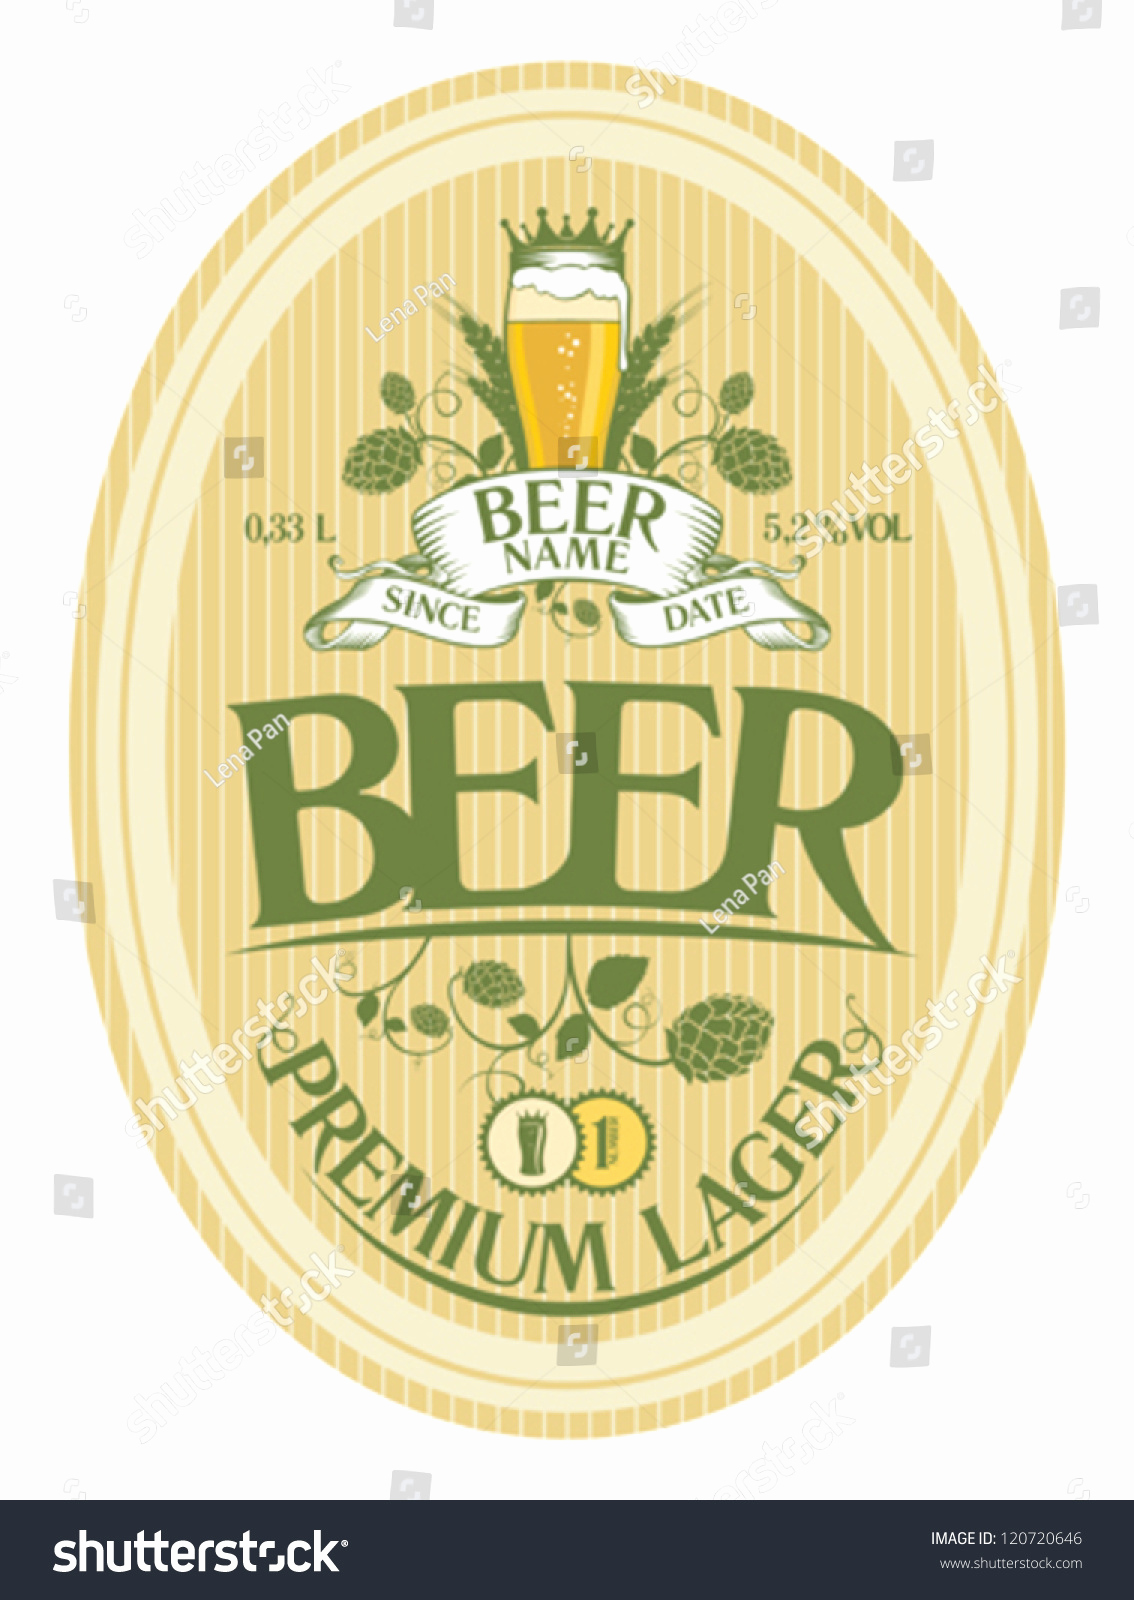 Beer Label Design Template Unique Beer Label Design Template Stock Vector Illustration